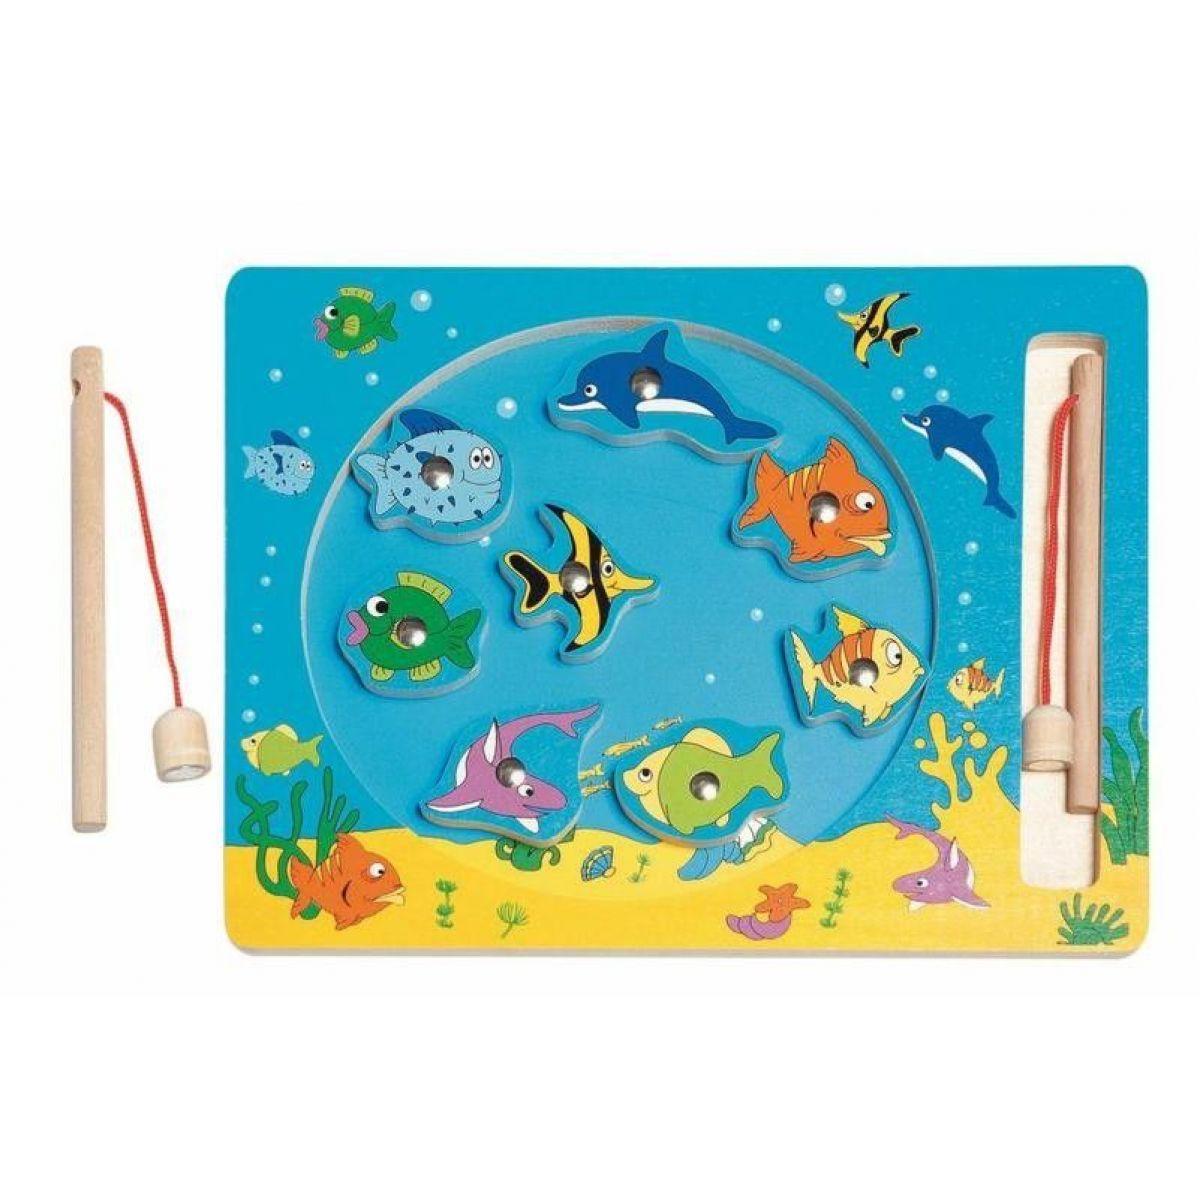 Woody Kruh Rybolov magnetická hra